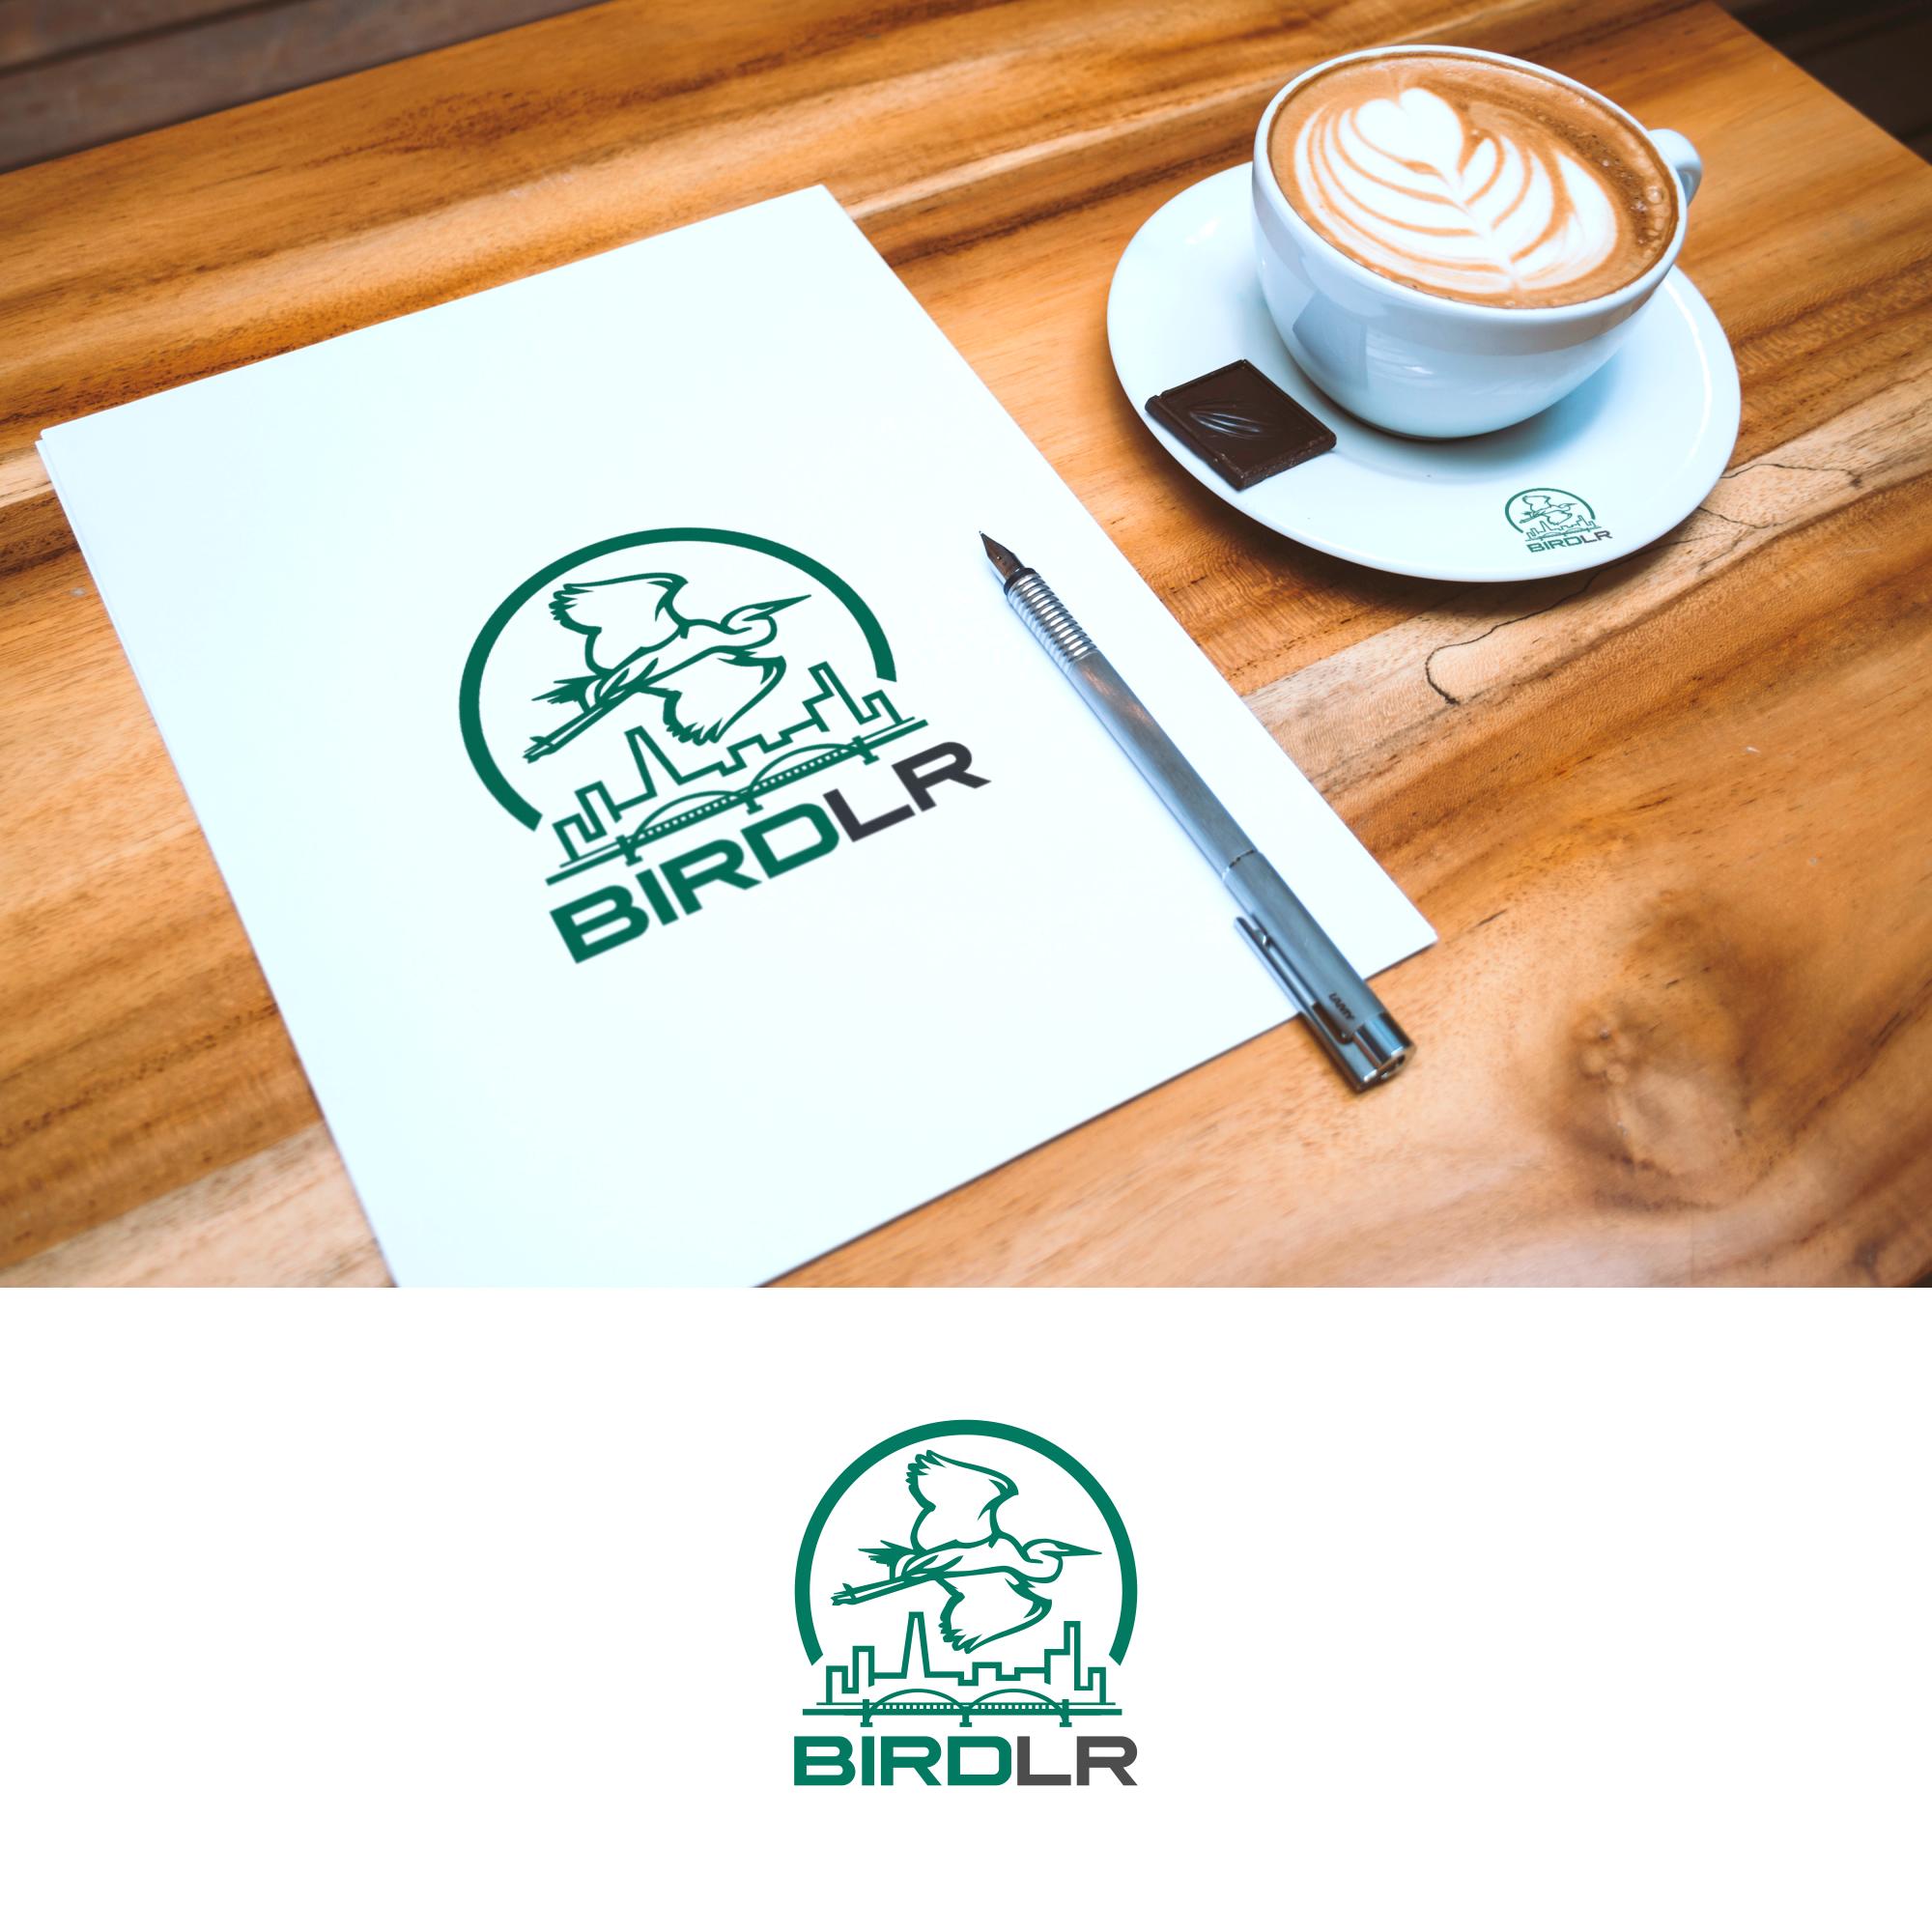 Urban Birds: create an event logo for BirdLR